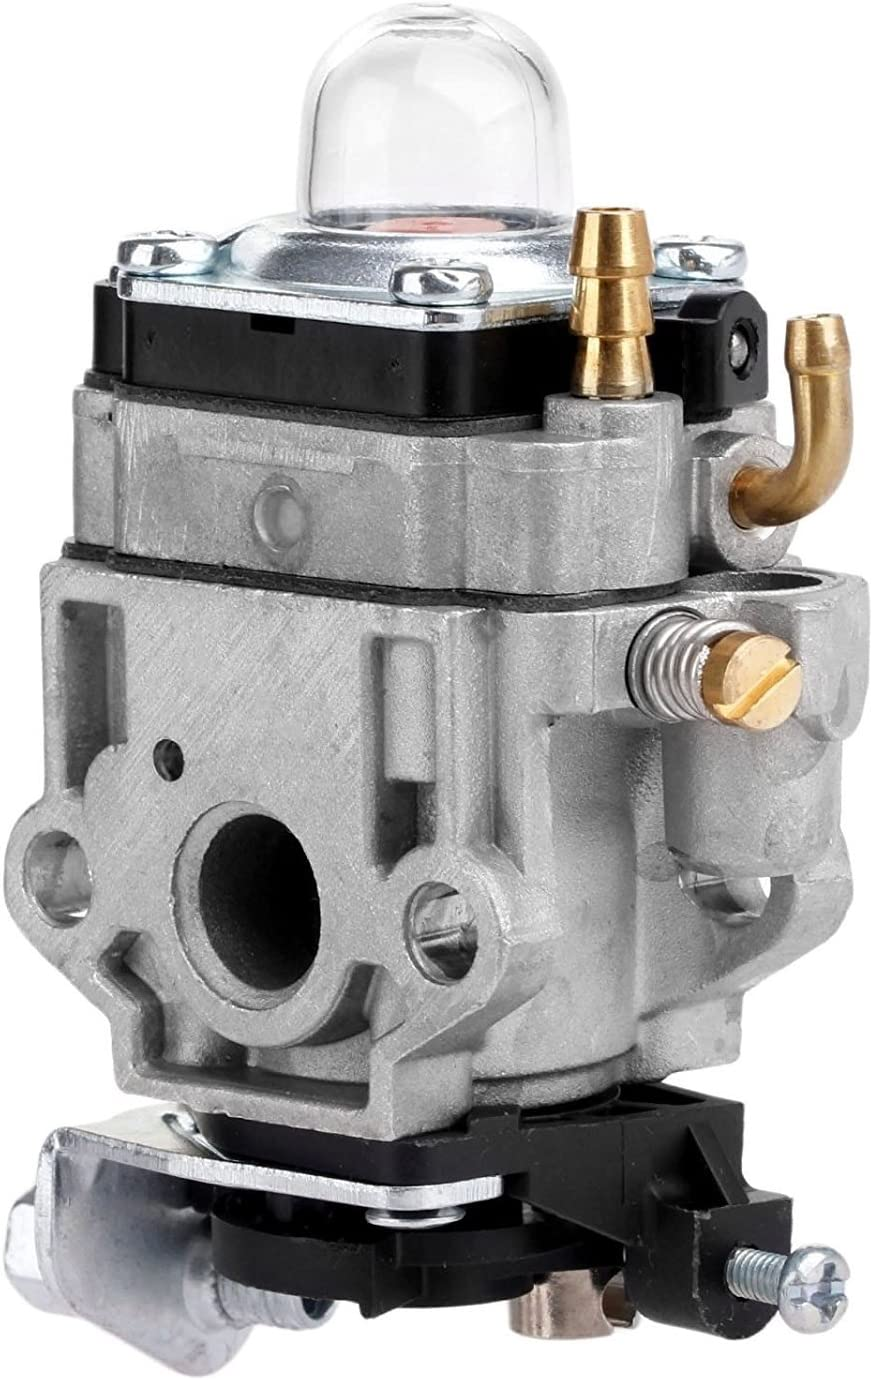 Carburador AL-KO Motor Sense libre Schneider AL-KO BC 410 – 4125 ...